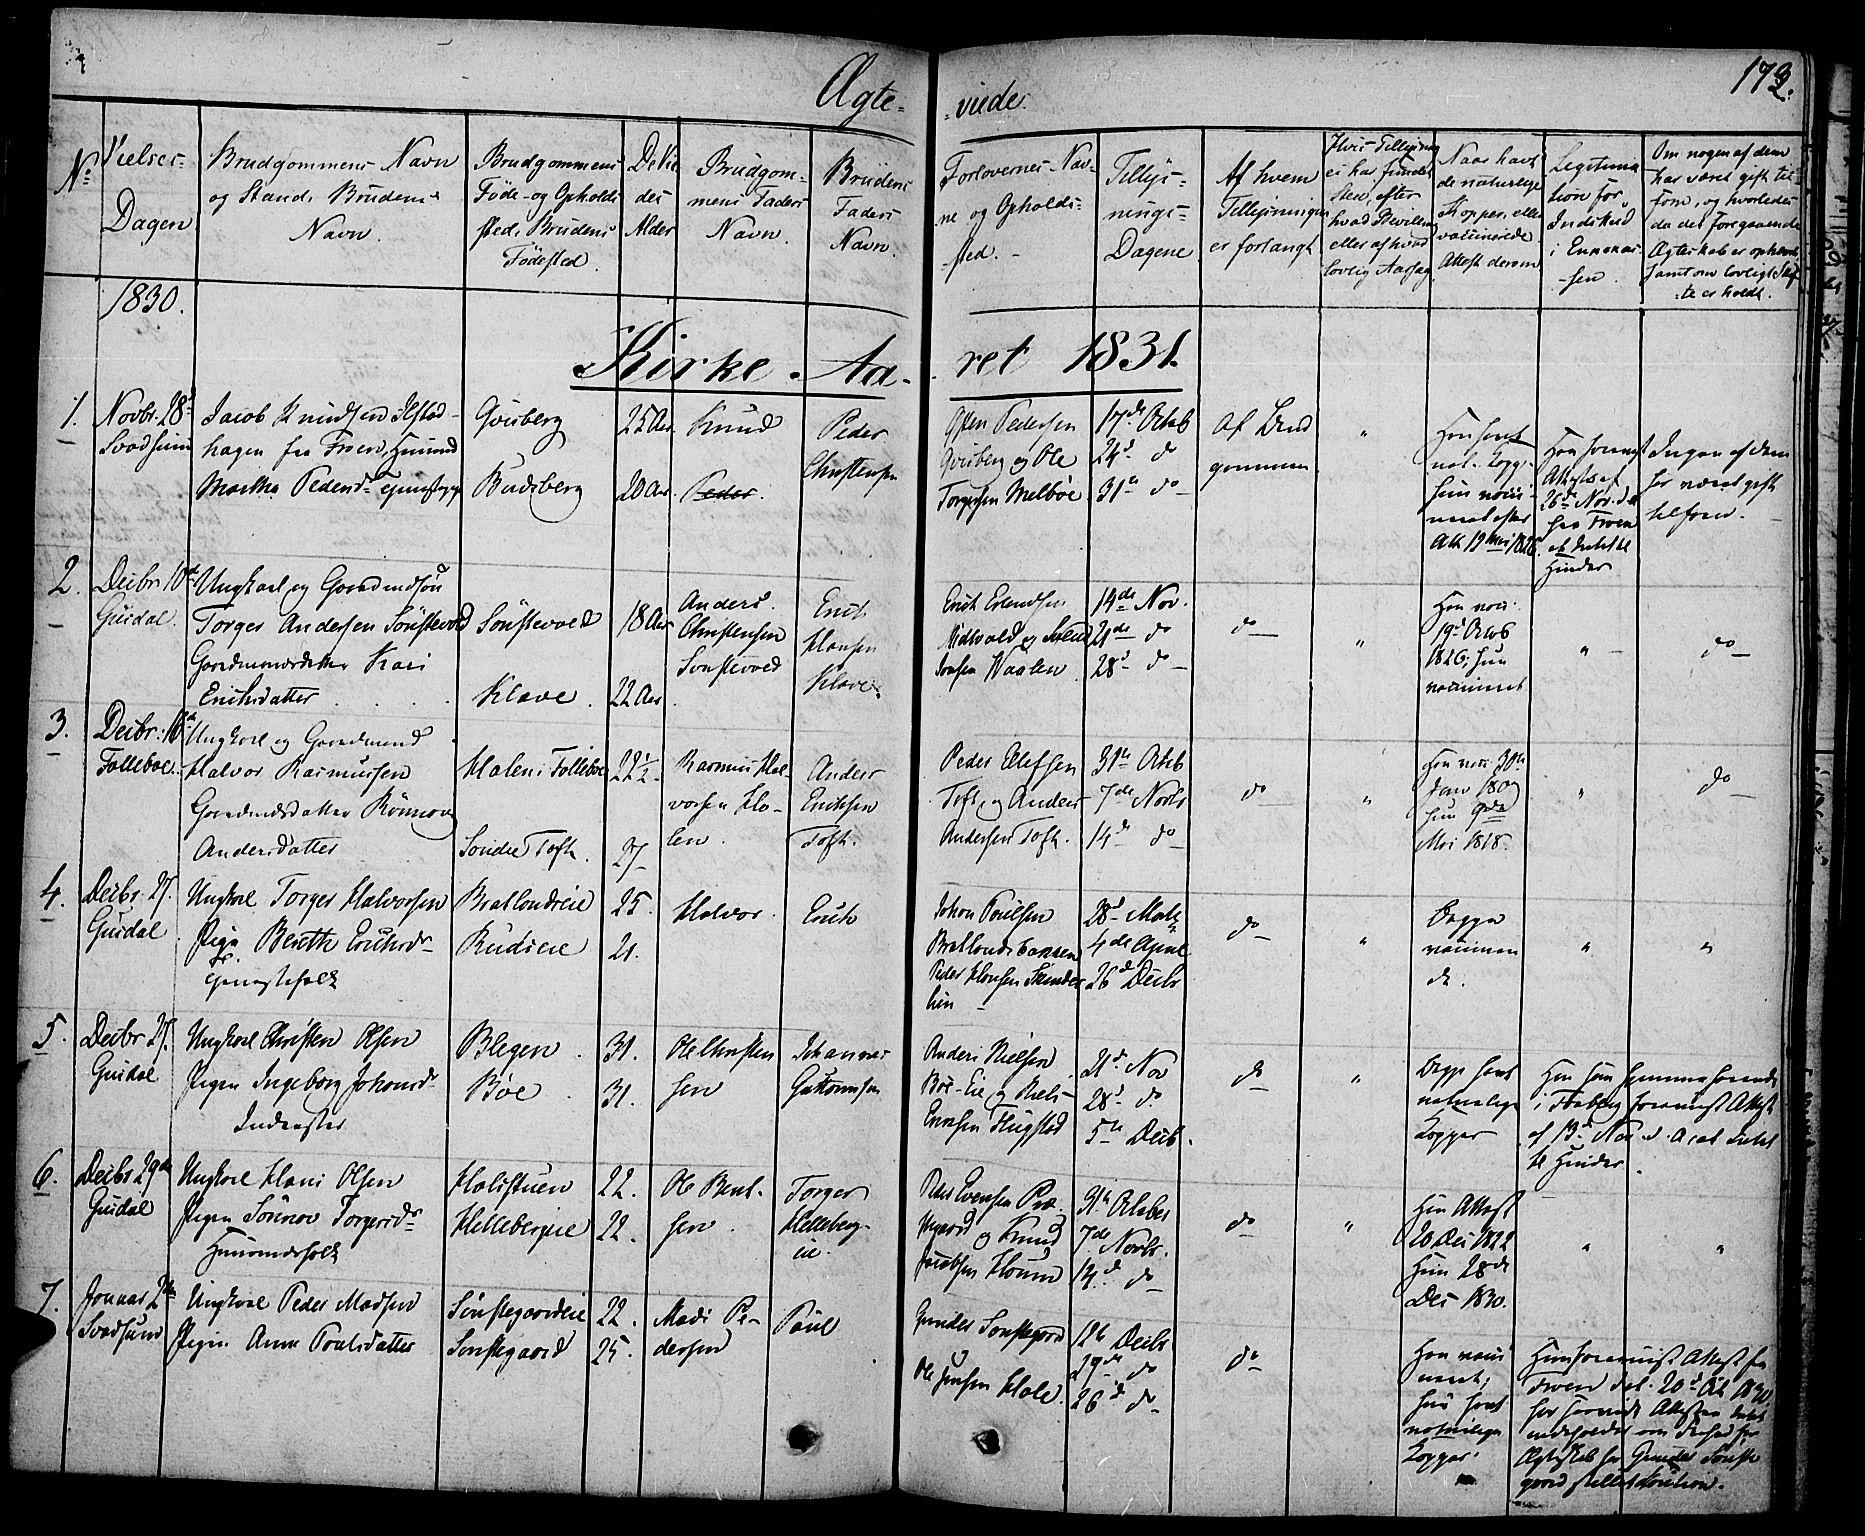 SAH, Gausdal prestekontor, Ministerialbok nr. 6, 1830-1839, s. 173